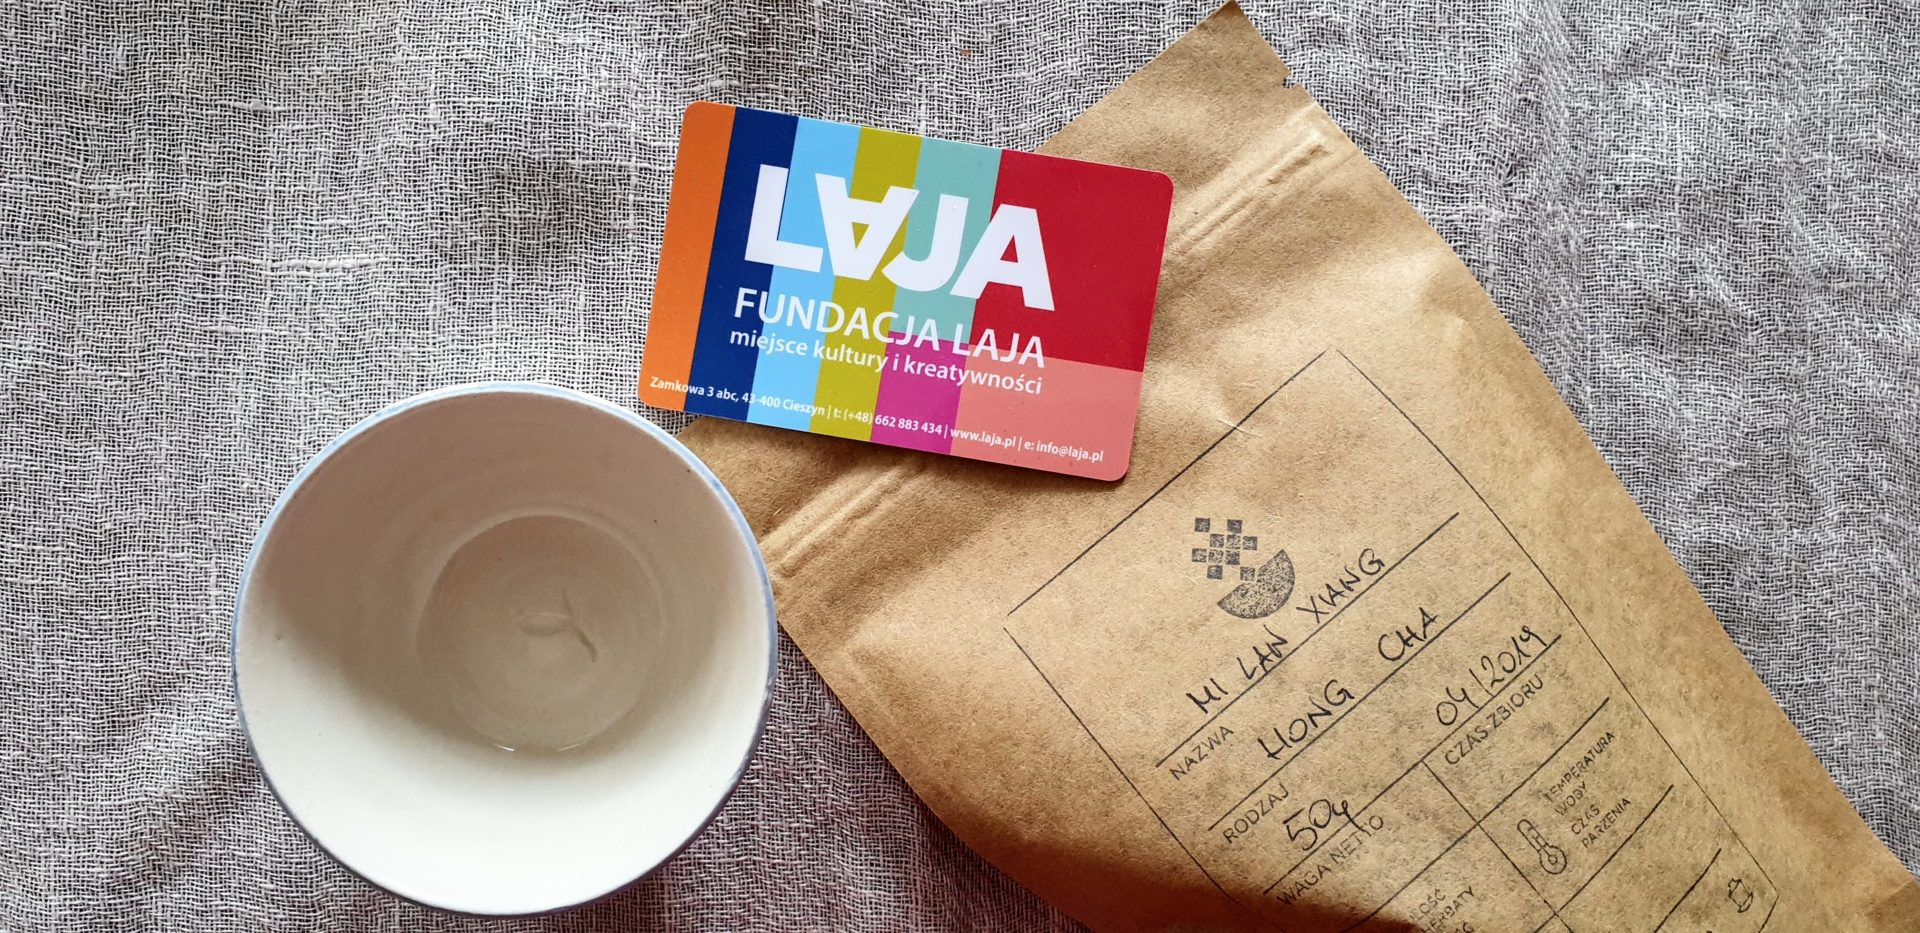 Opakowania: herbaciarnia Laja